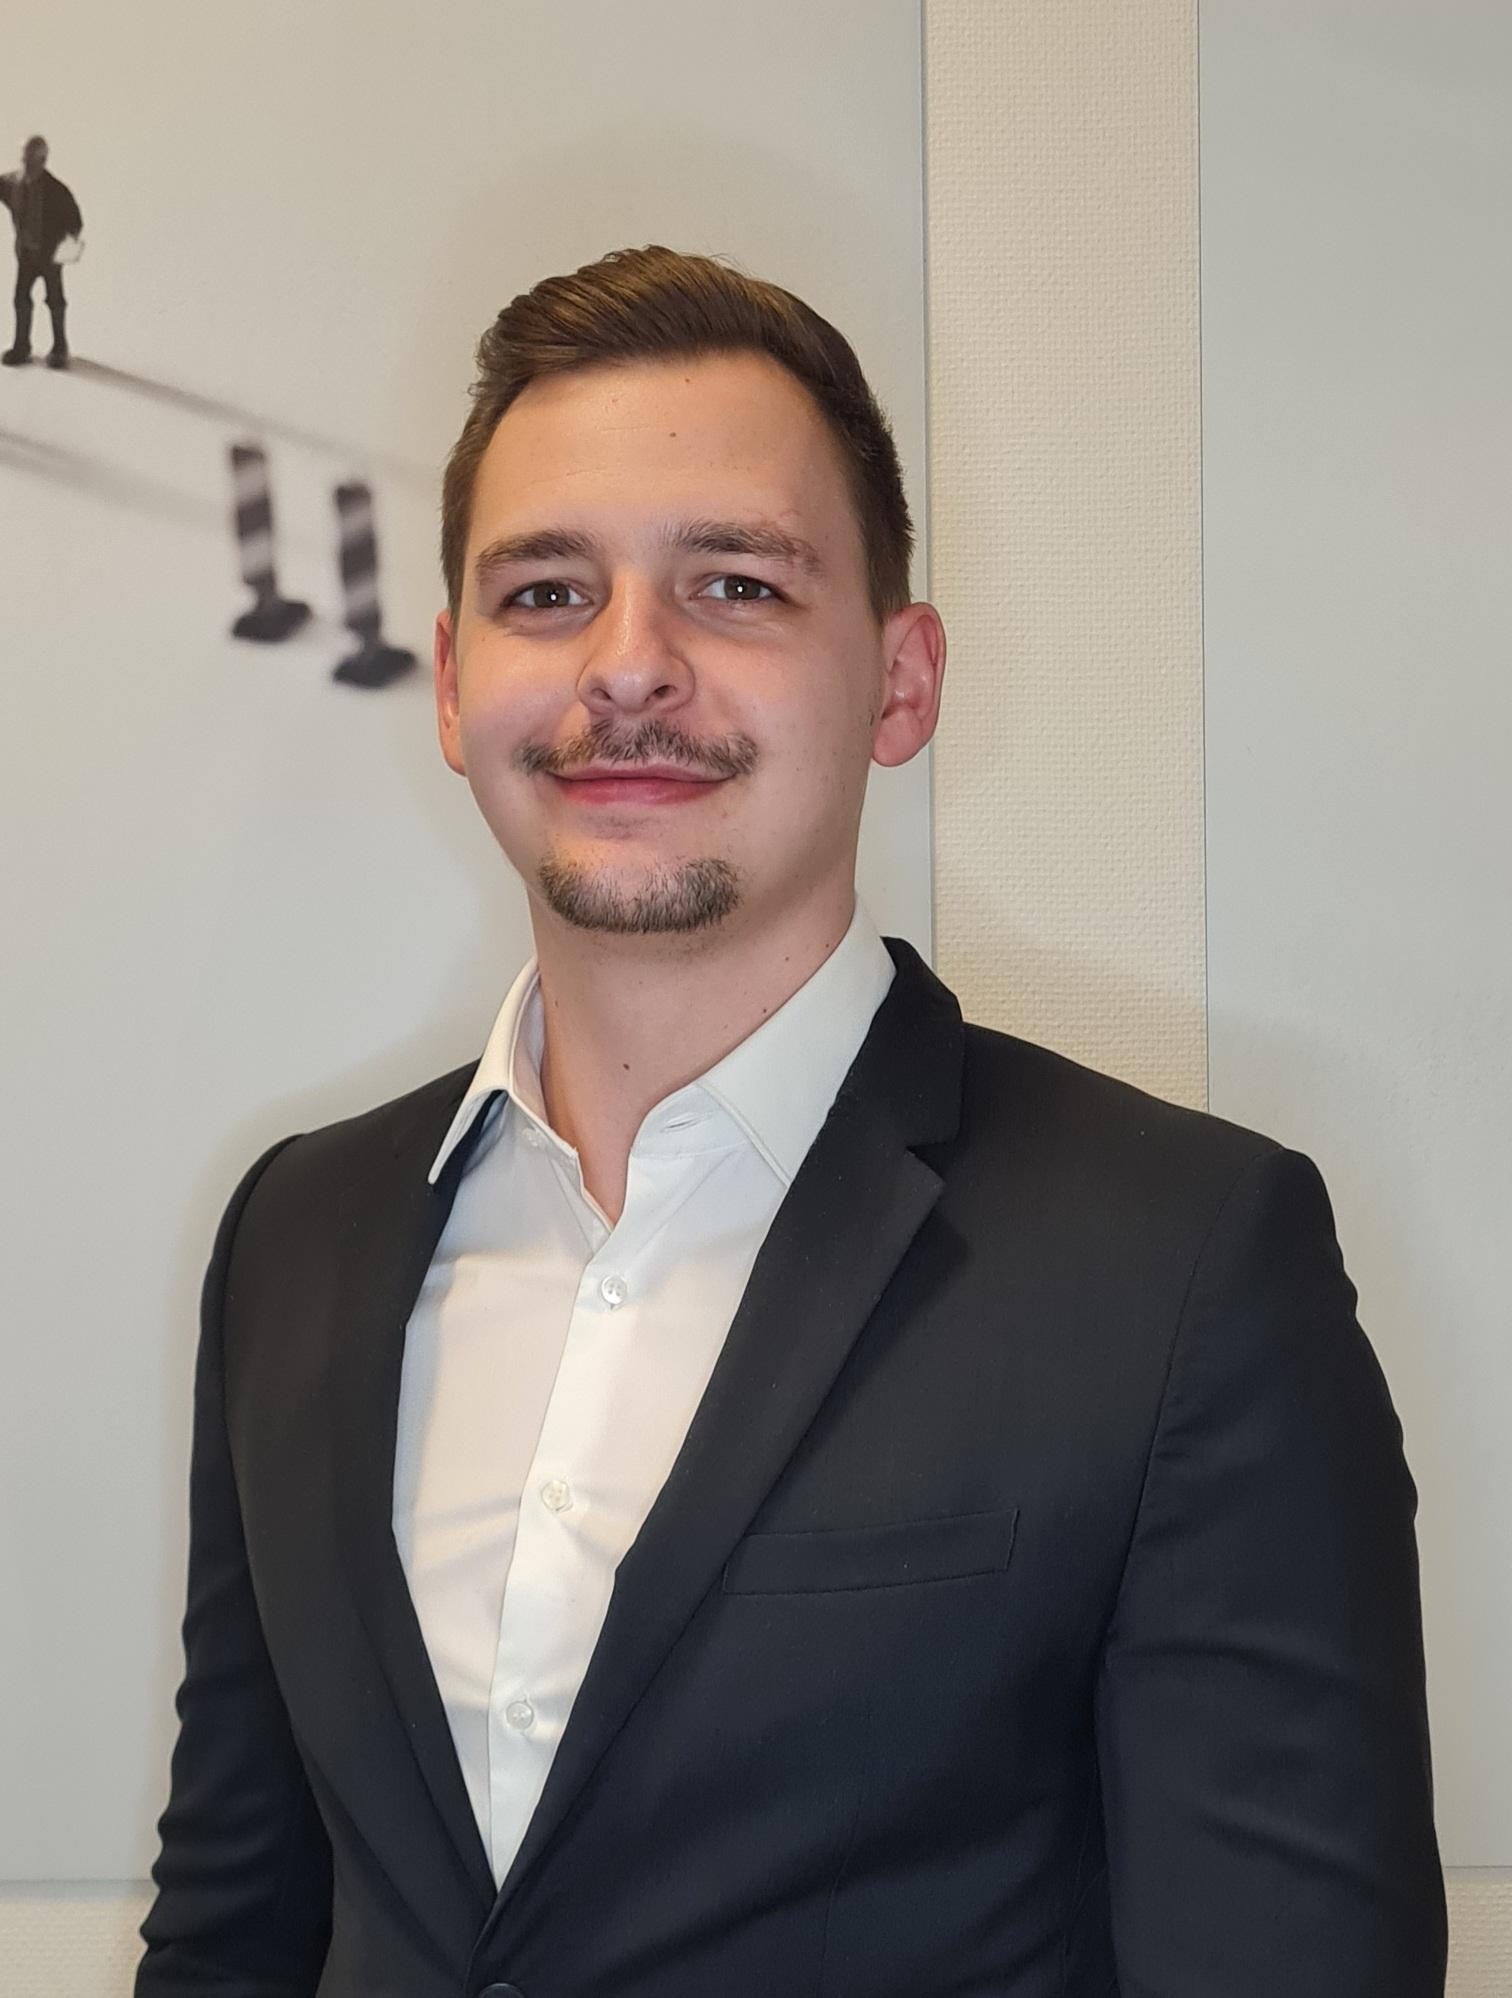 Maximilian Feicht